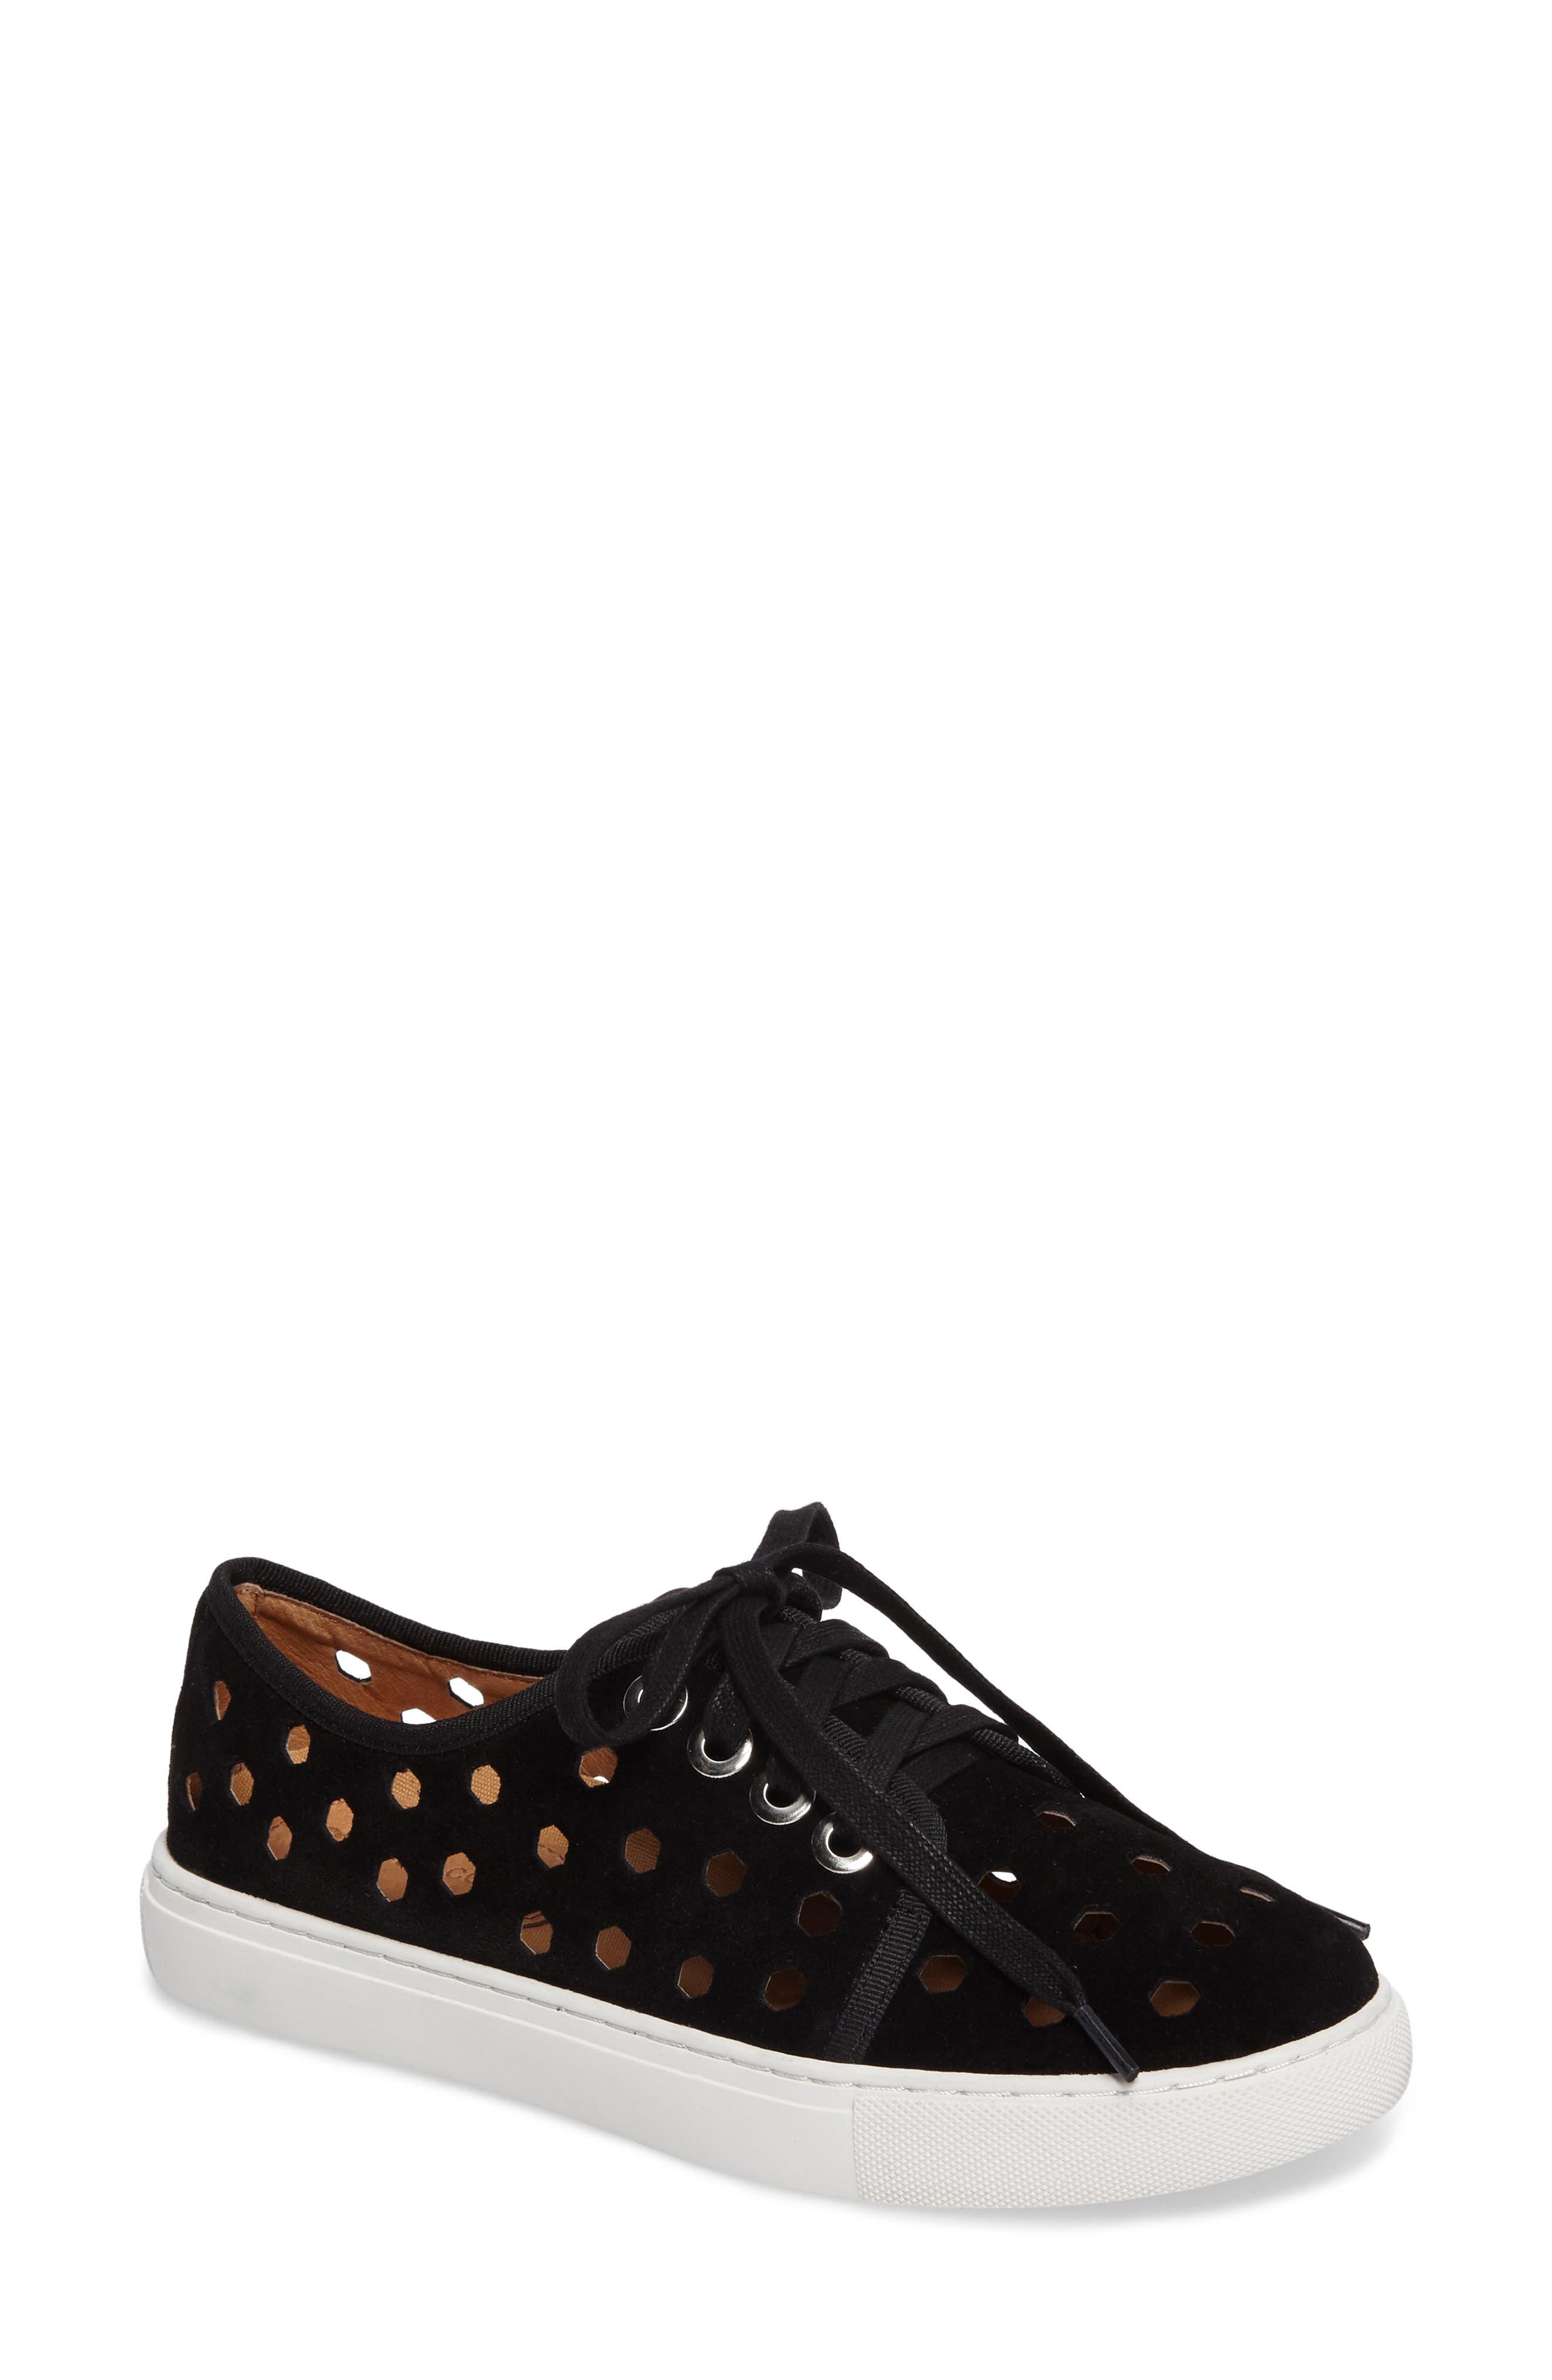 CC orso Como Rasta Perforated Sneaker,                         Main,                         color, 001